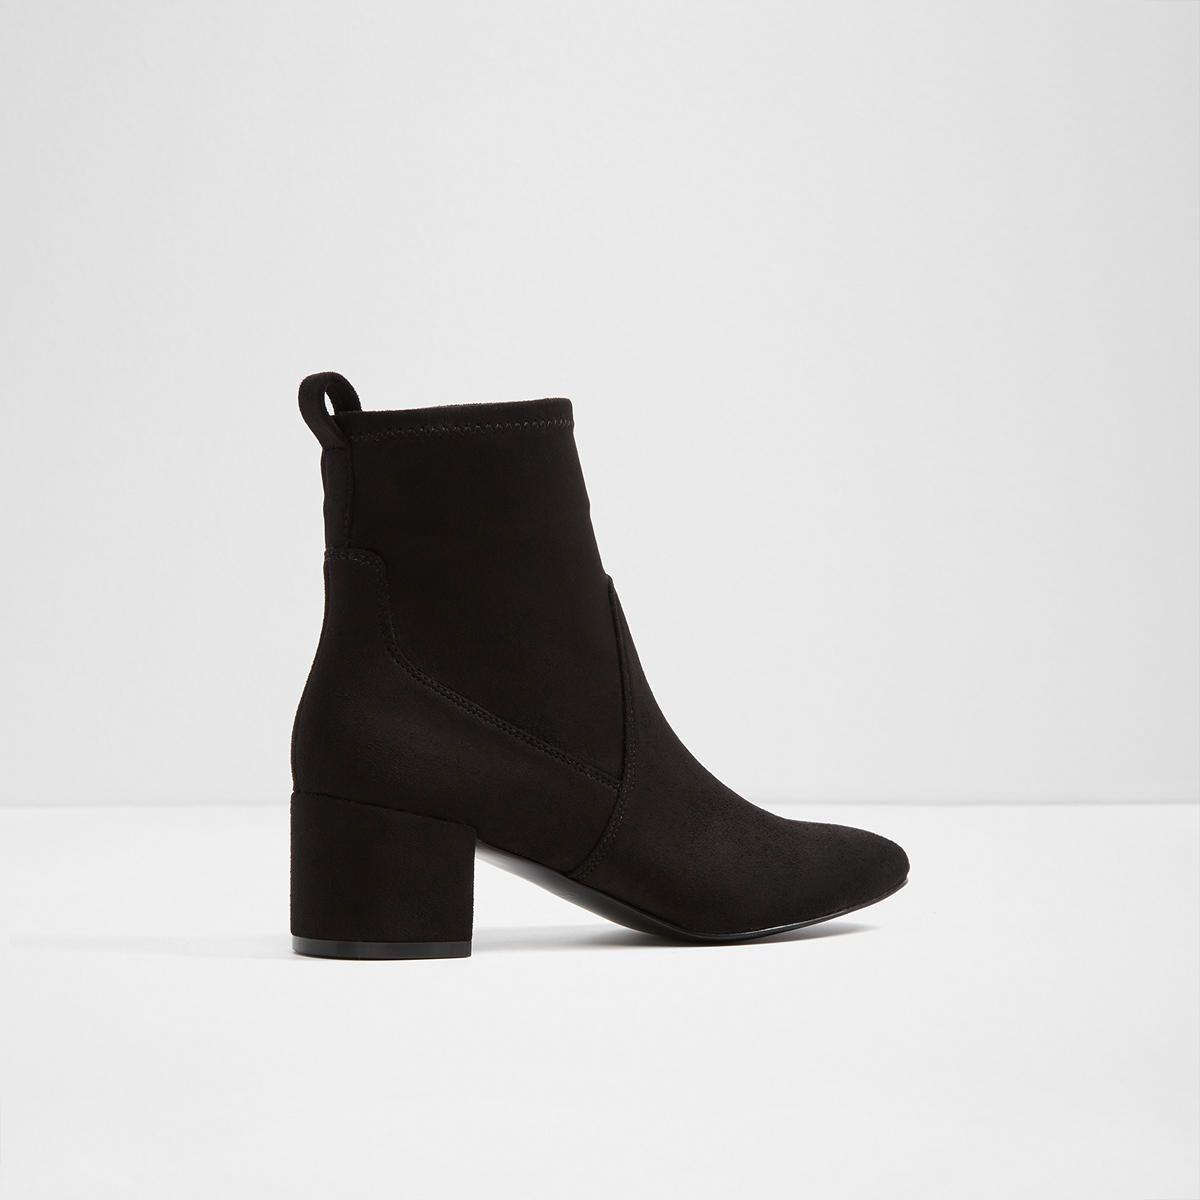 Stefi-N ALDO Boots SIZE 7